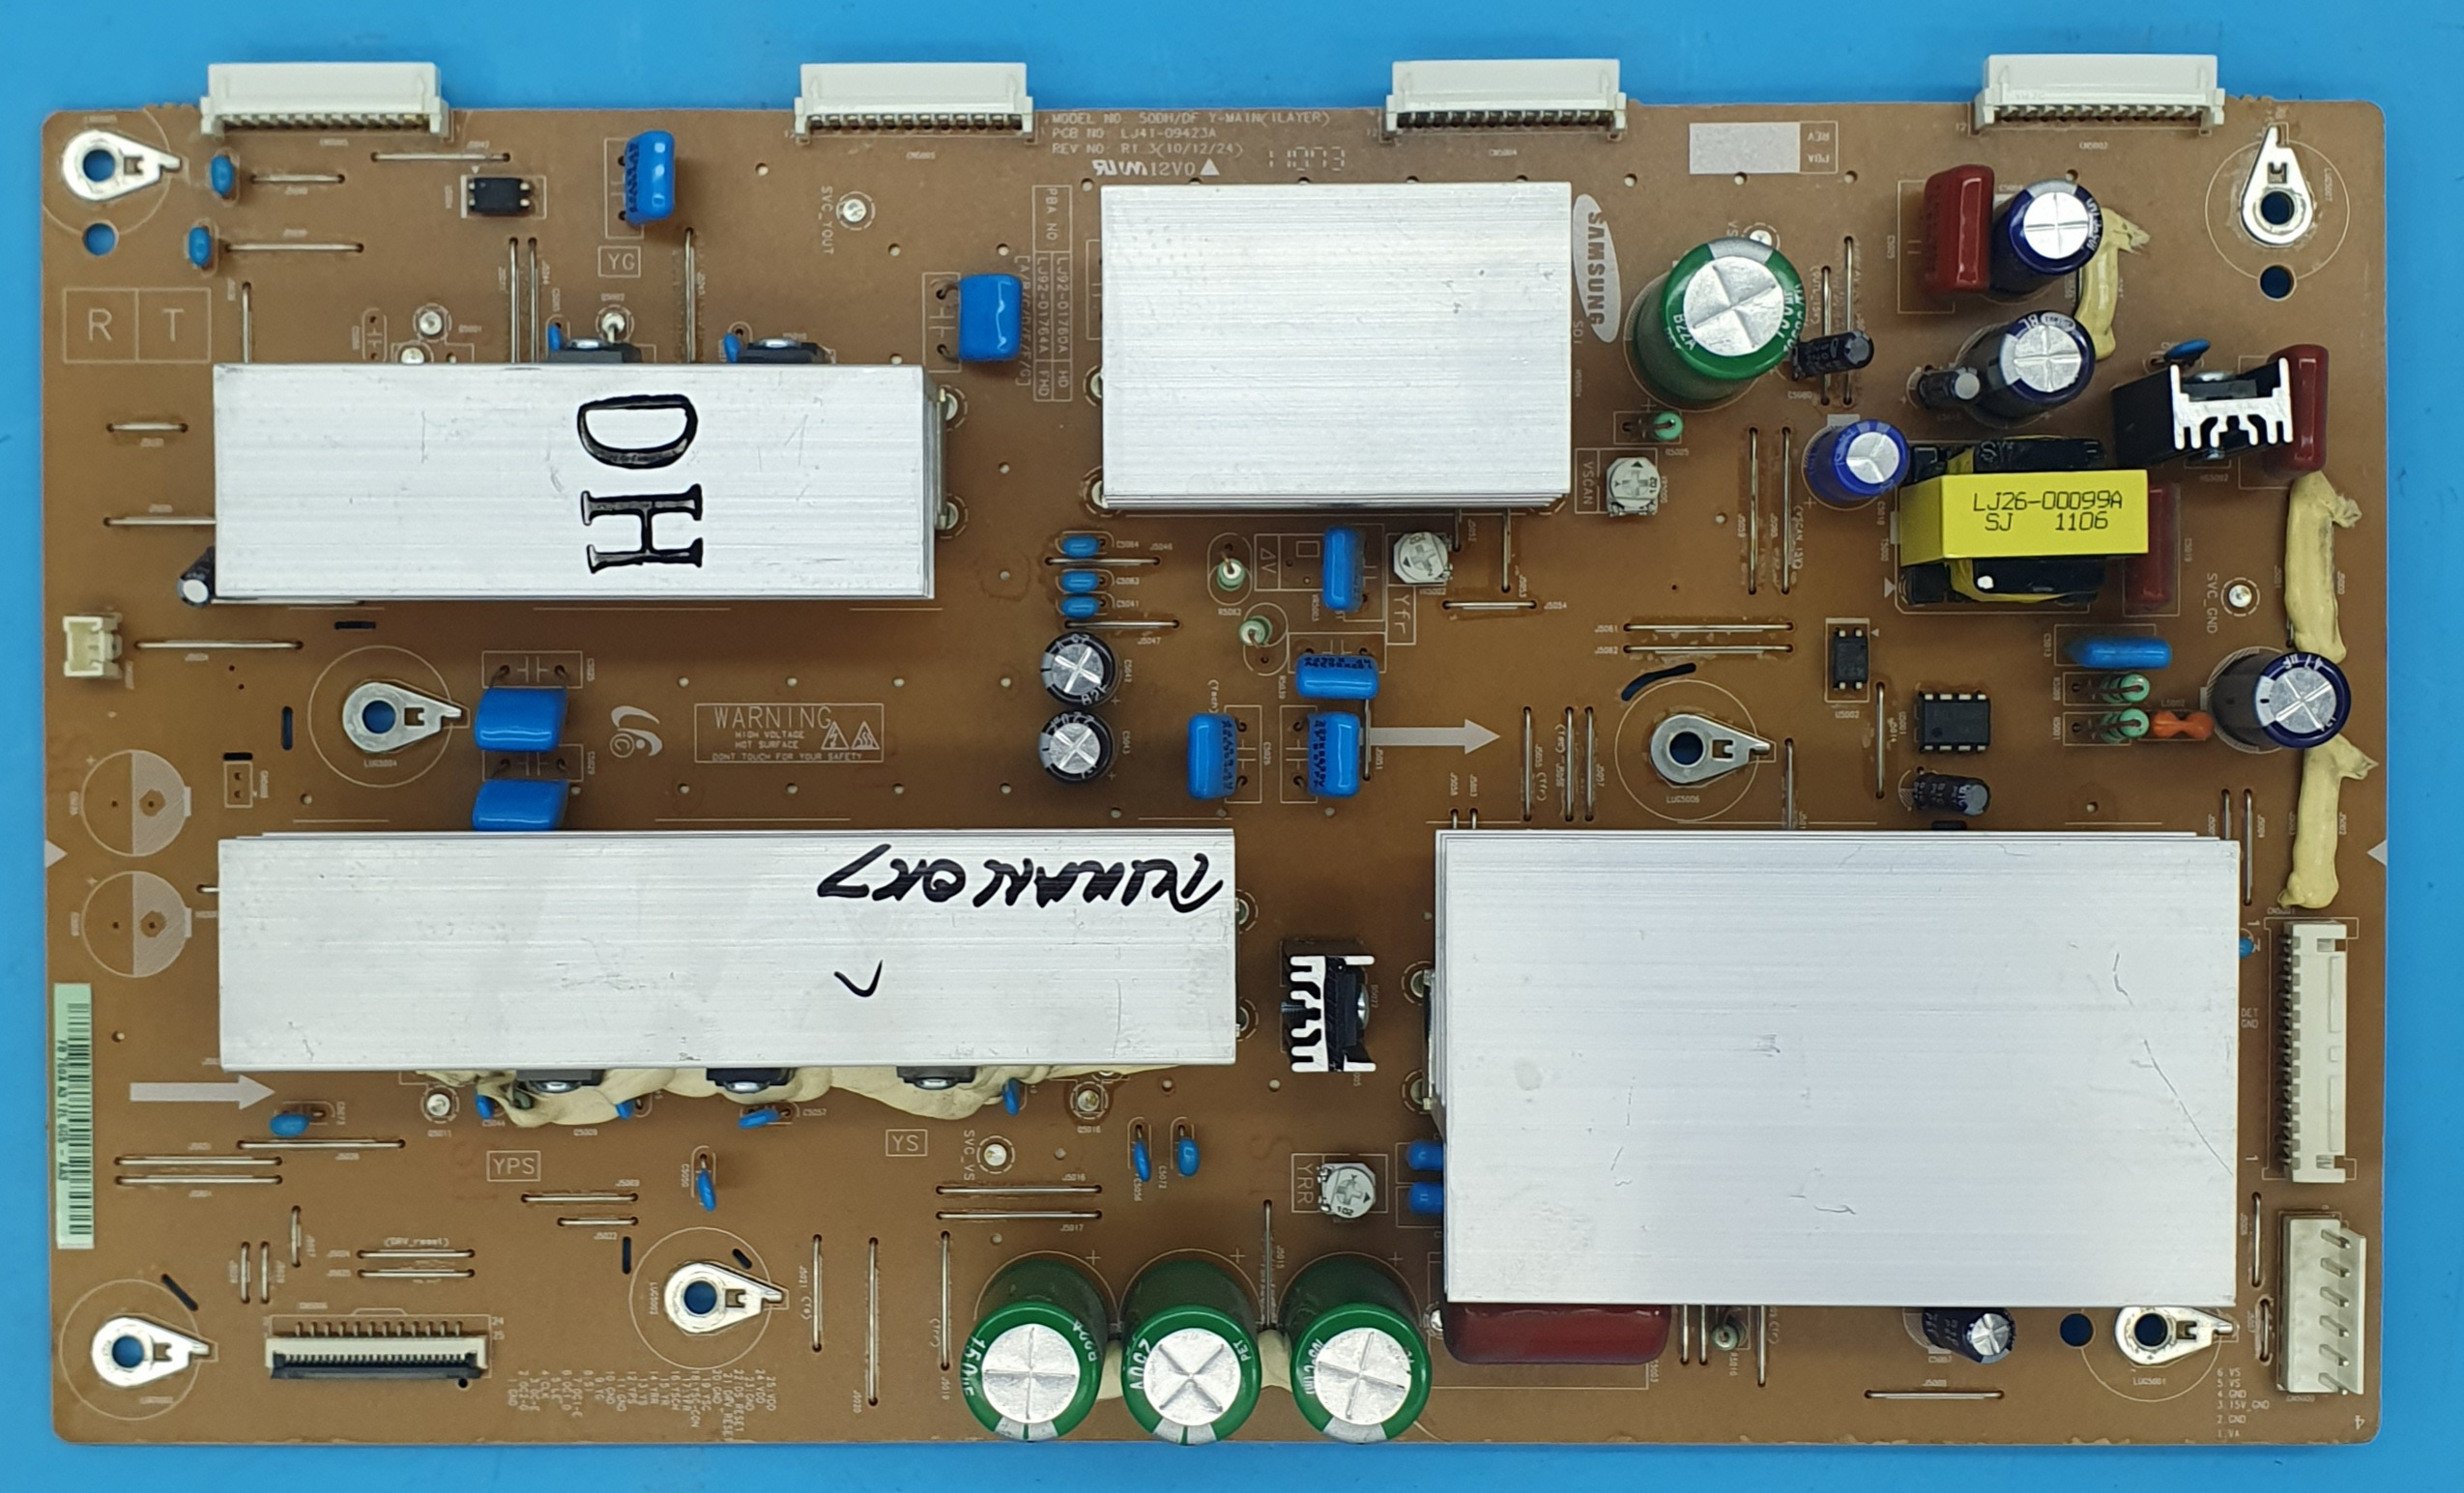 LJ41-09423A Samsung Power (KDV DAHİL = 150 TL)